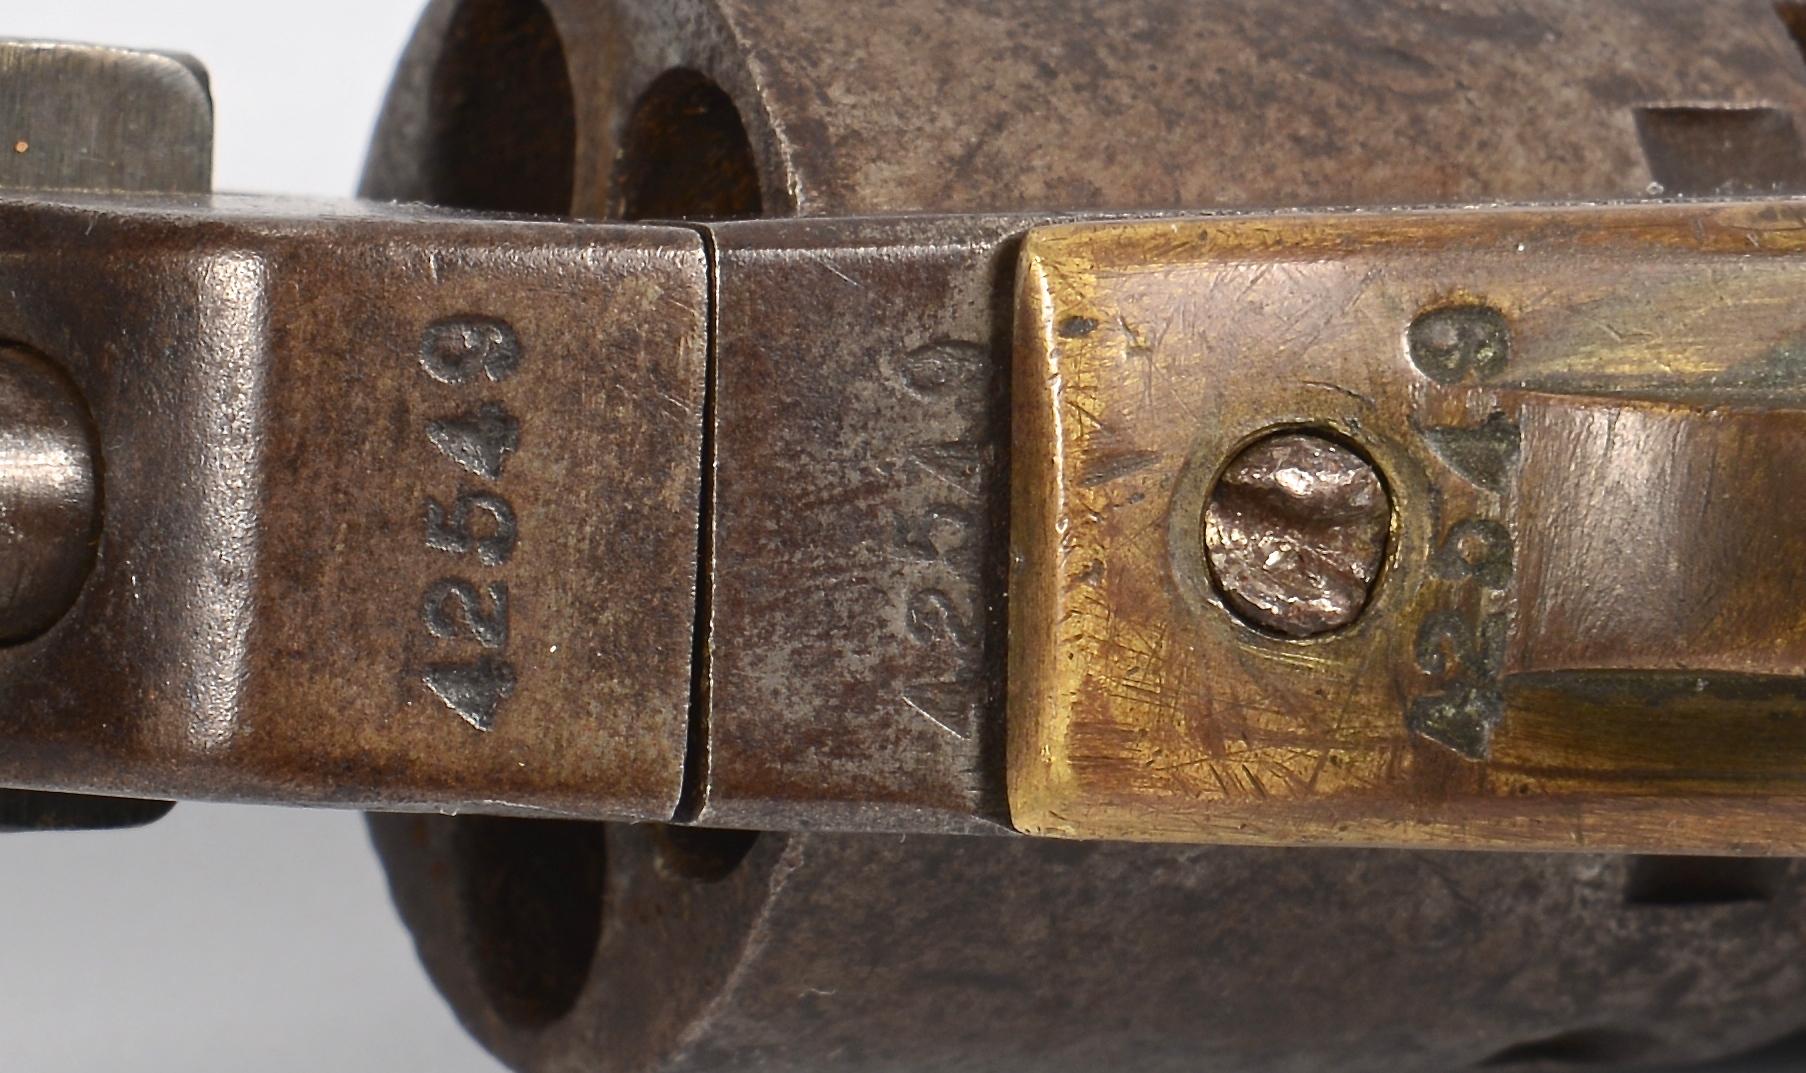 Lot 529: Manhattan Navy Revolver Series III, .36 Cal